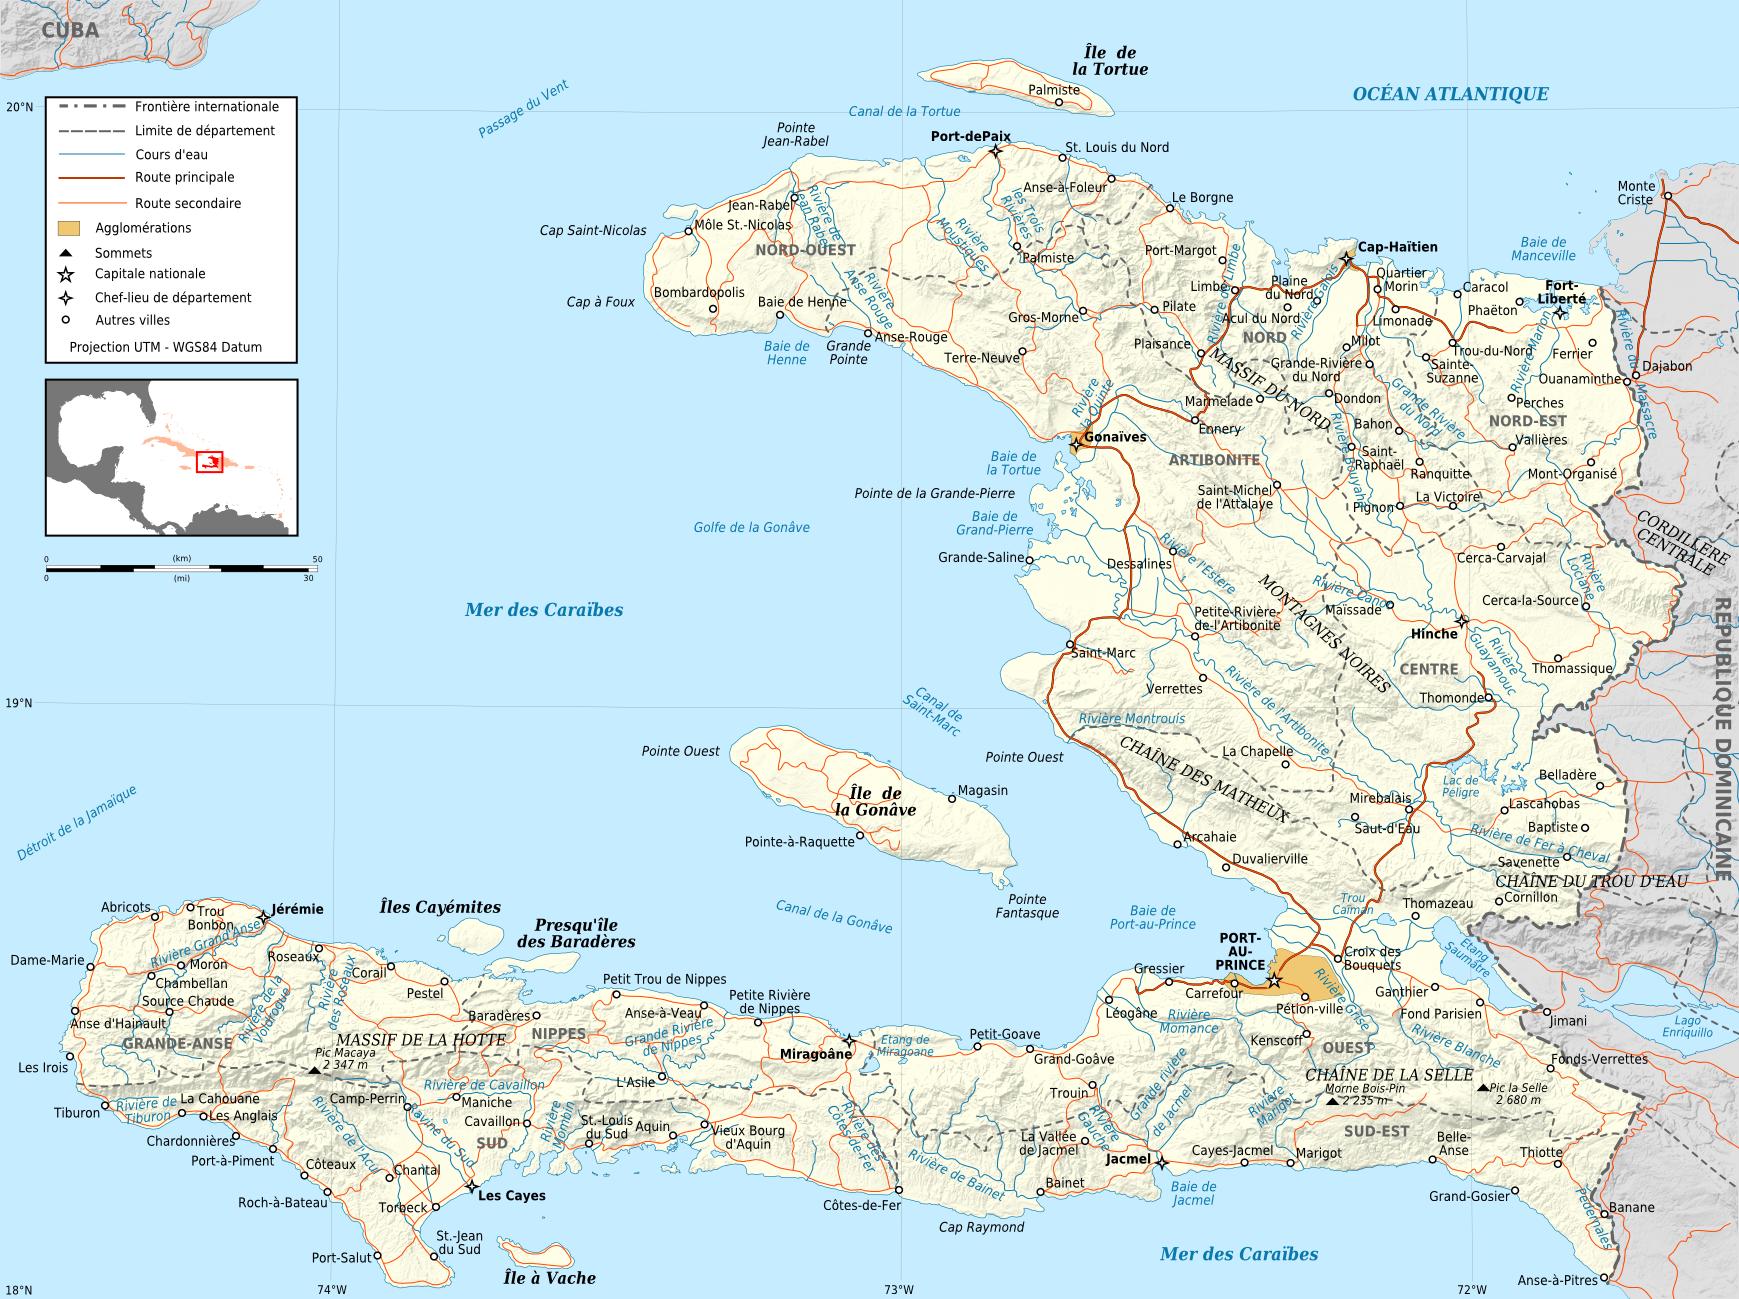 Mapofmap1 sayfa 8 incoming search termshaiti map of haiti gumiabroncs Choice Image